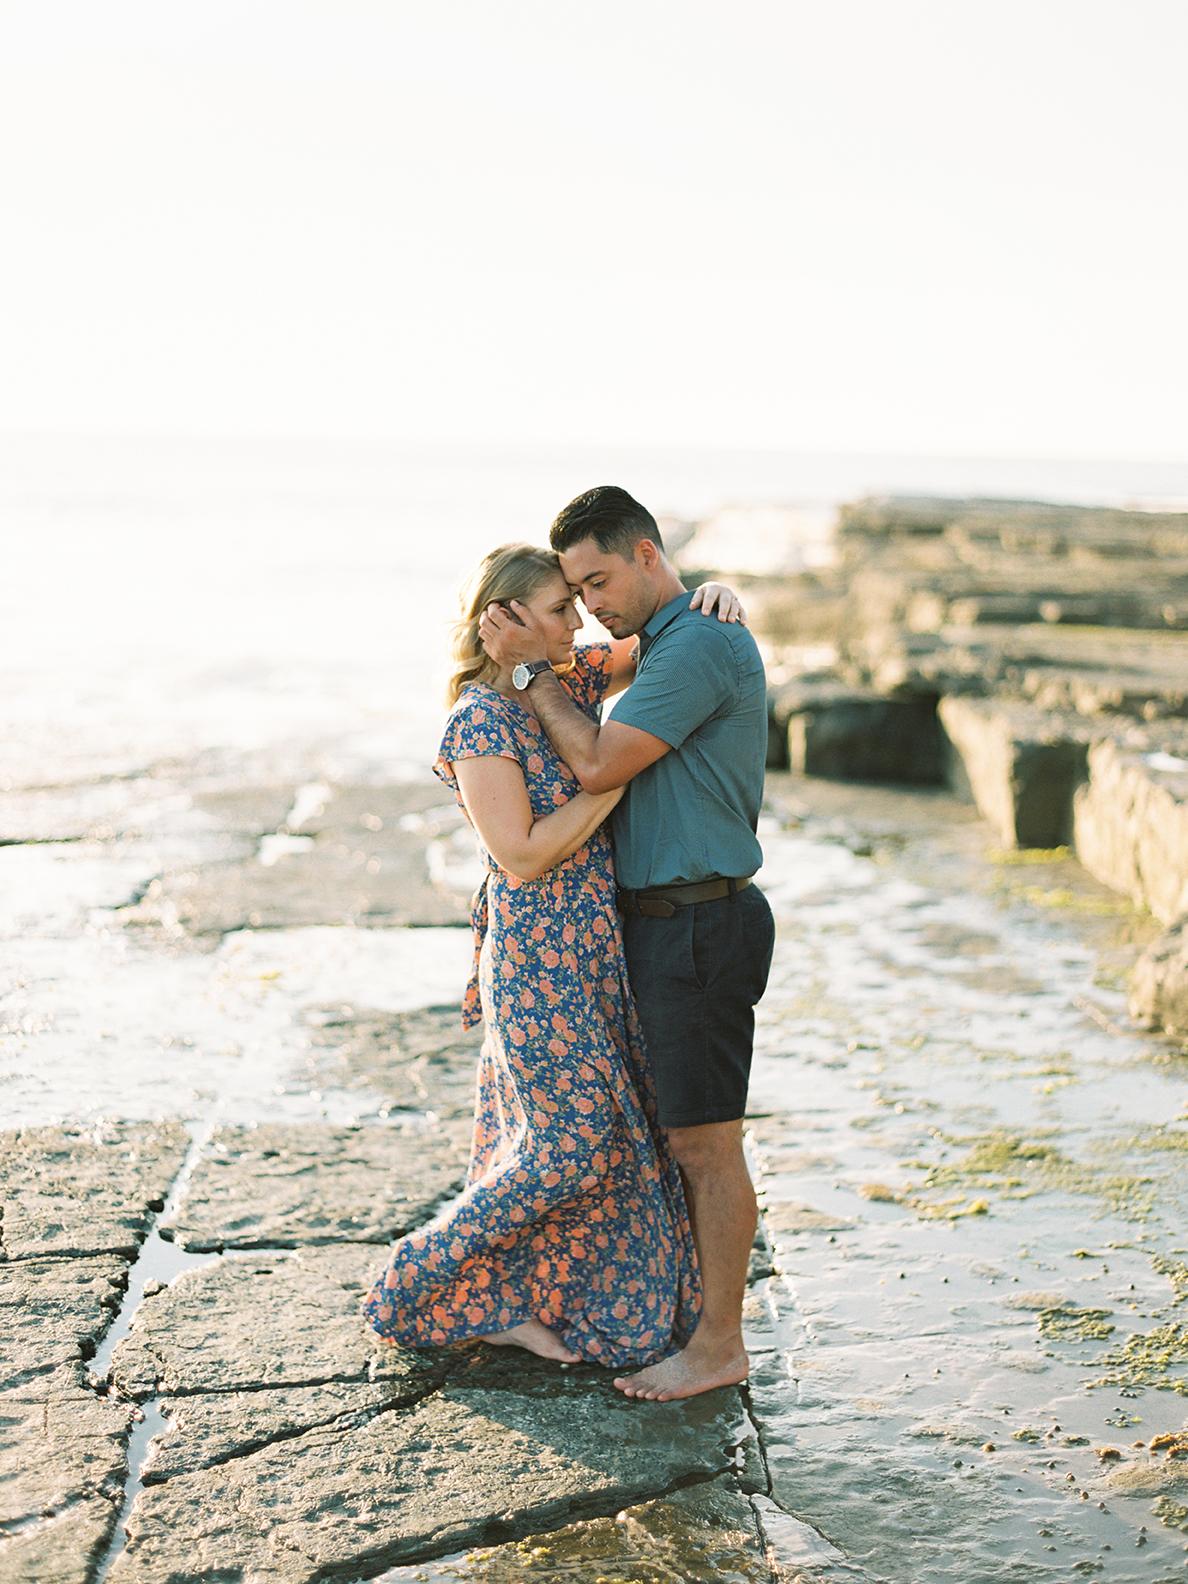 179-fine-art-film-photographer-wedding-engagement-jacob+cammye-destination-wedding-nicaragua-brumley & wells photography-rehearsal-dinner.jpg